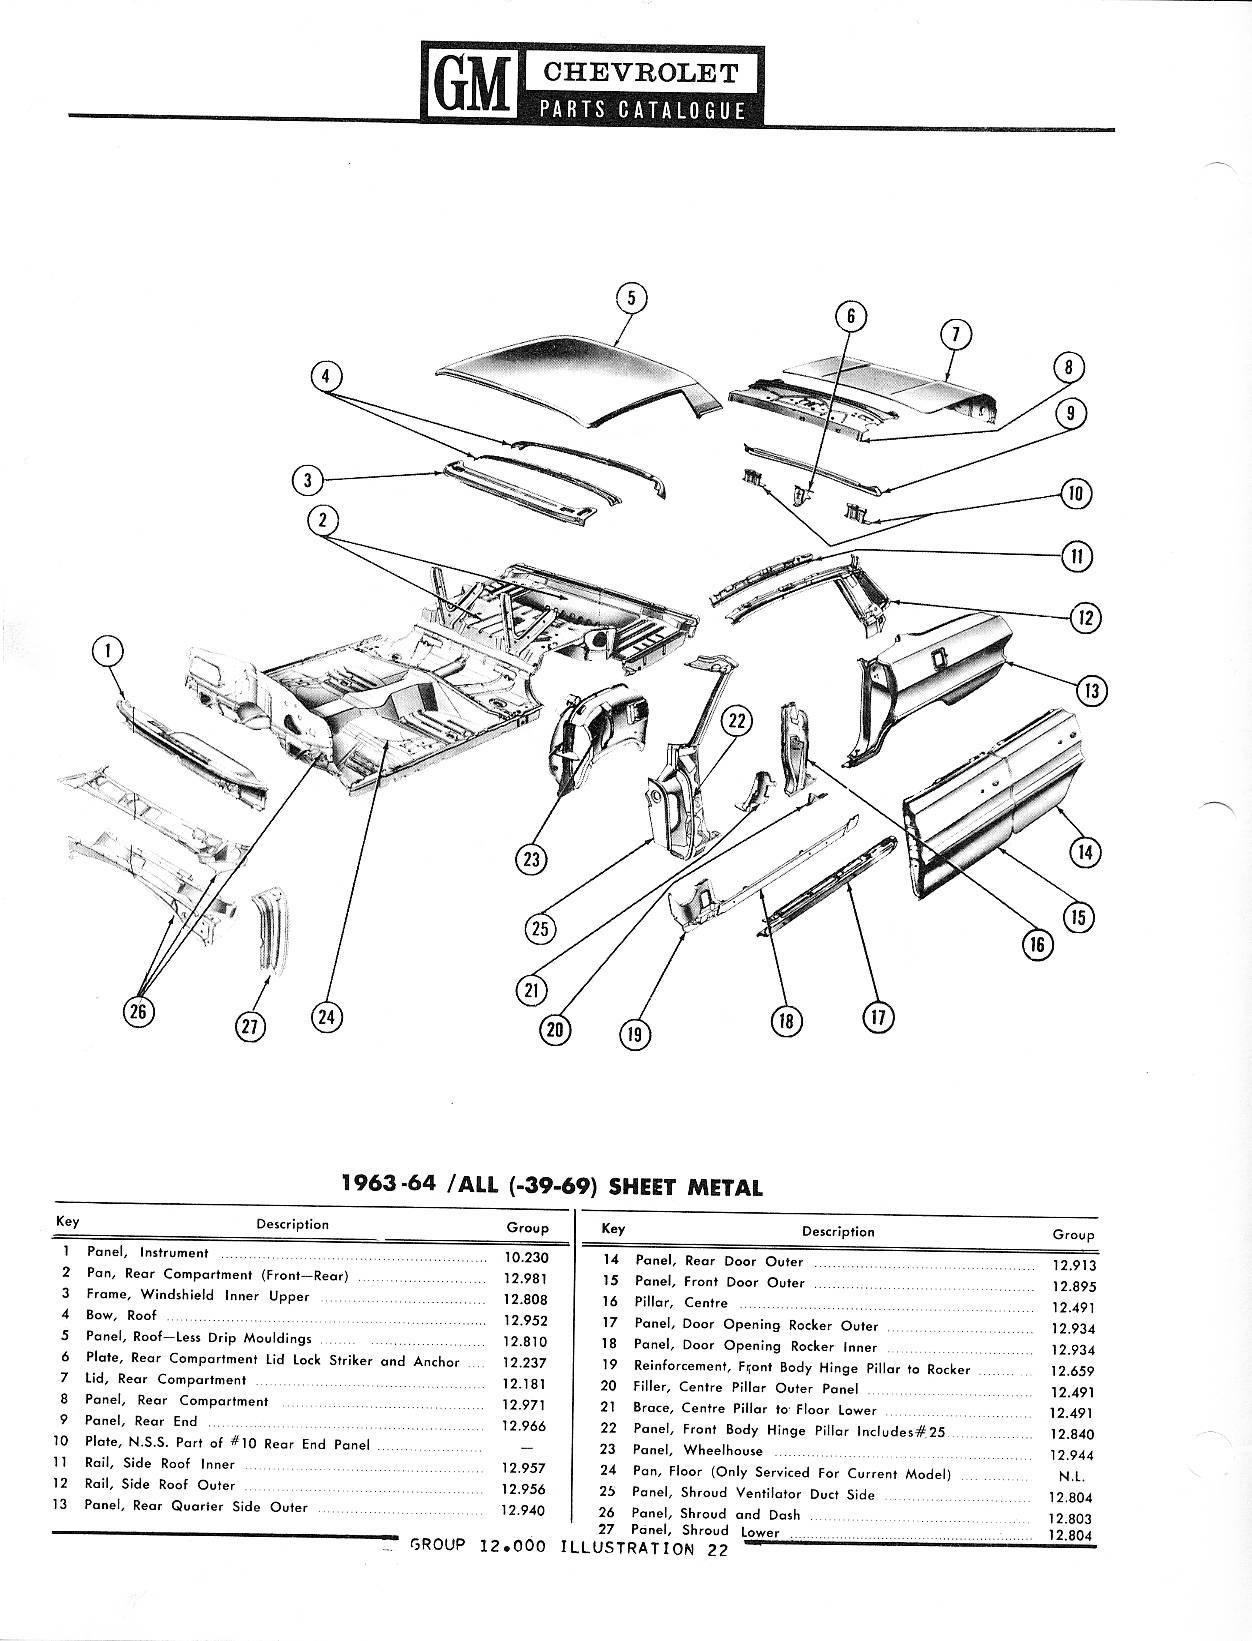 1958-1968 Chevrolet Parts Catalog / Image178.jpg